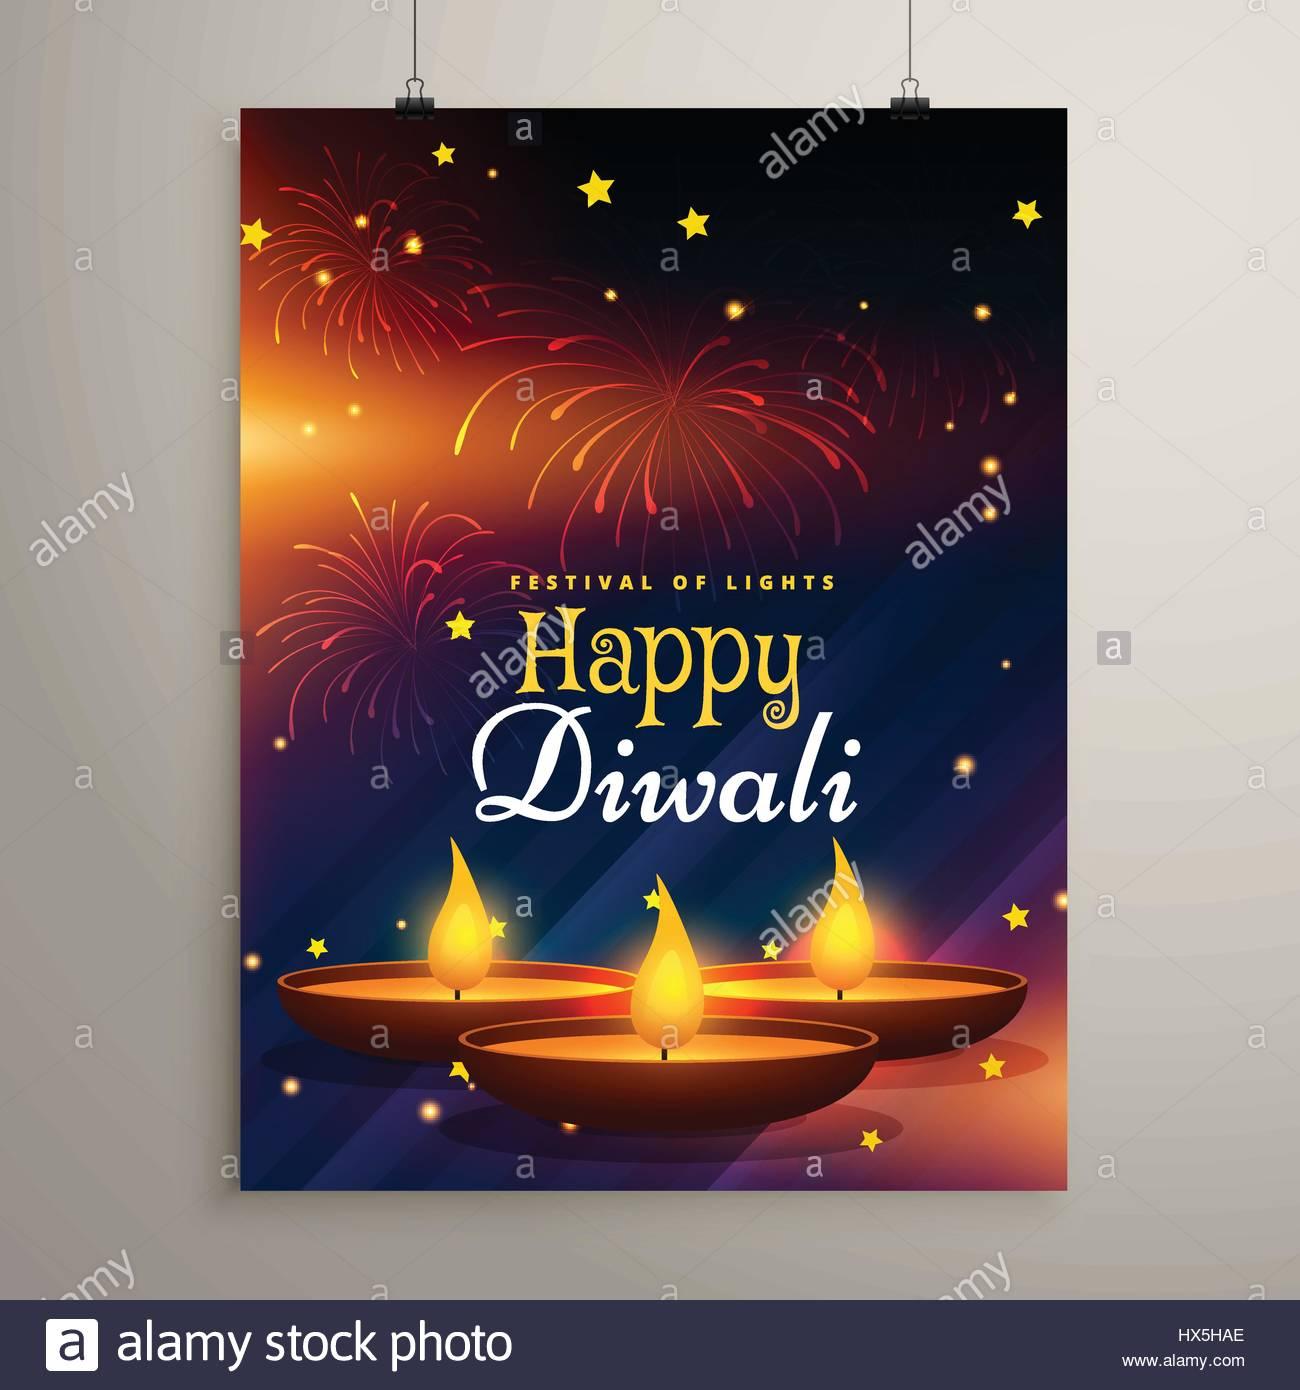 Flyer design for diwali festival diwali greeting card stock flyer design for diwali festival diwali greeting card kristyandbryce Choice Image